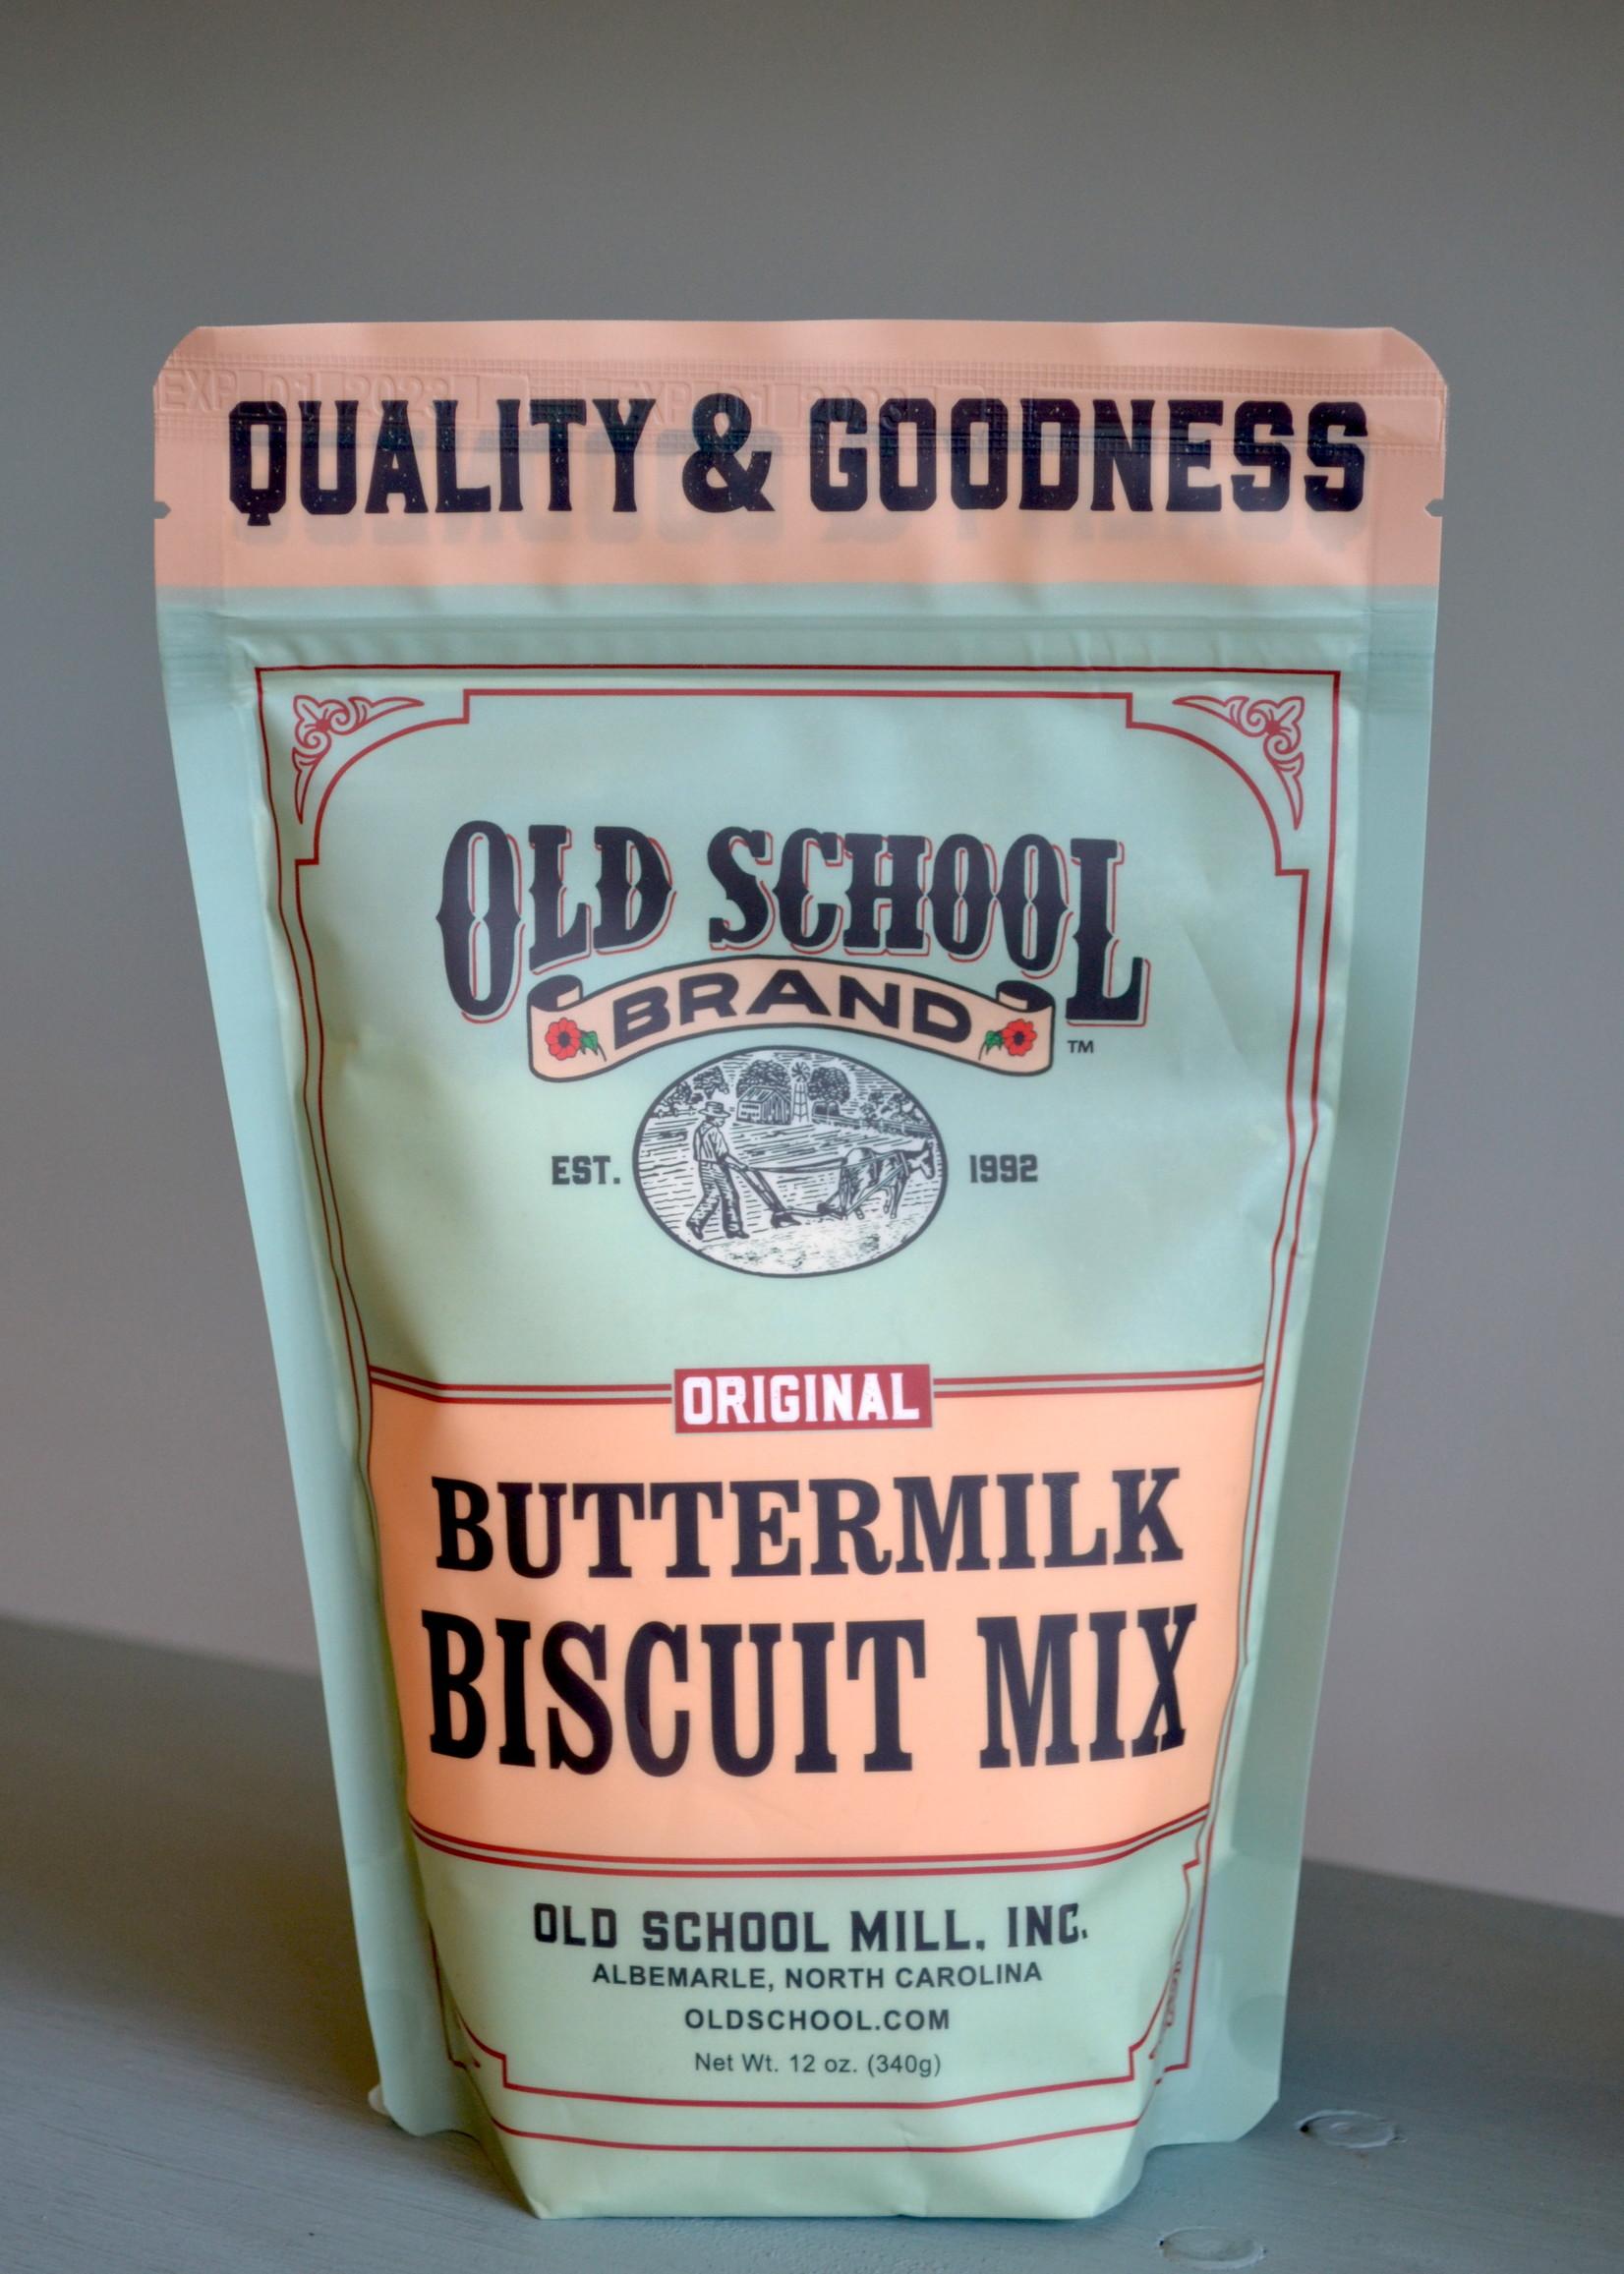 Old School Mill Old School Buttermilk Biscuit Mix